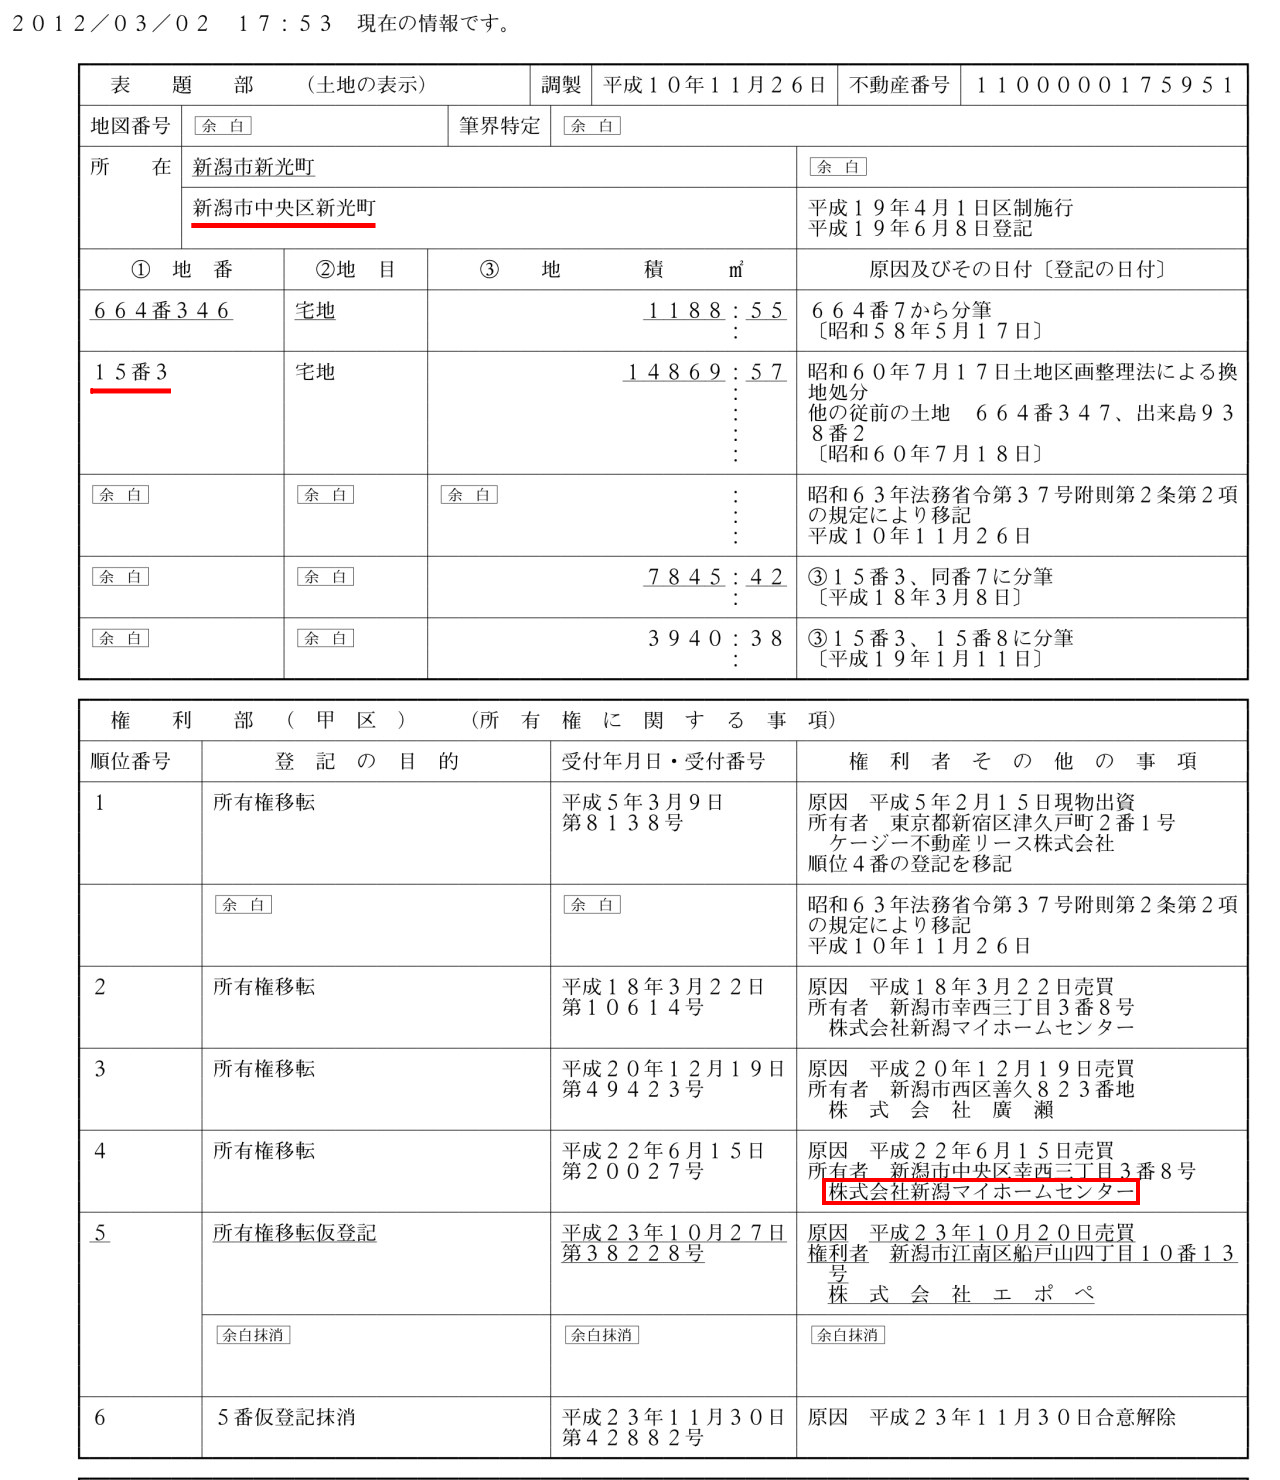 nigata_ryojikan_tochi3.jpg